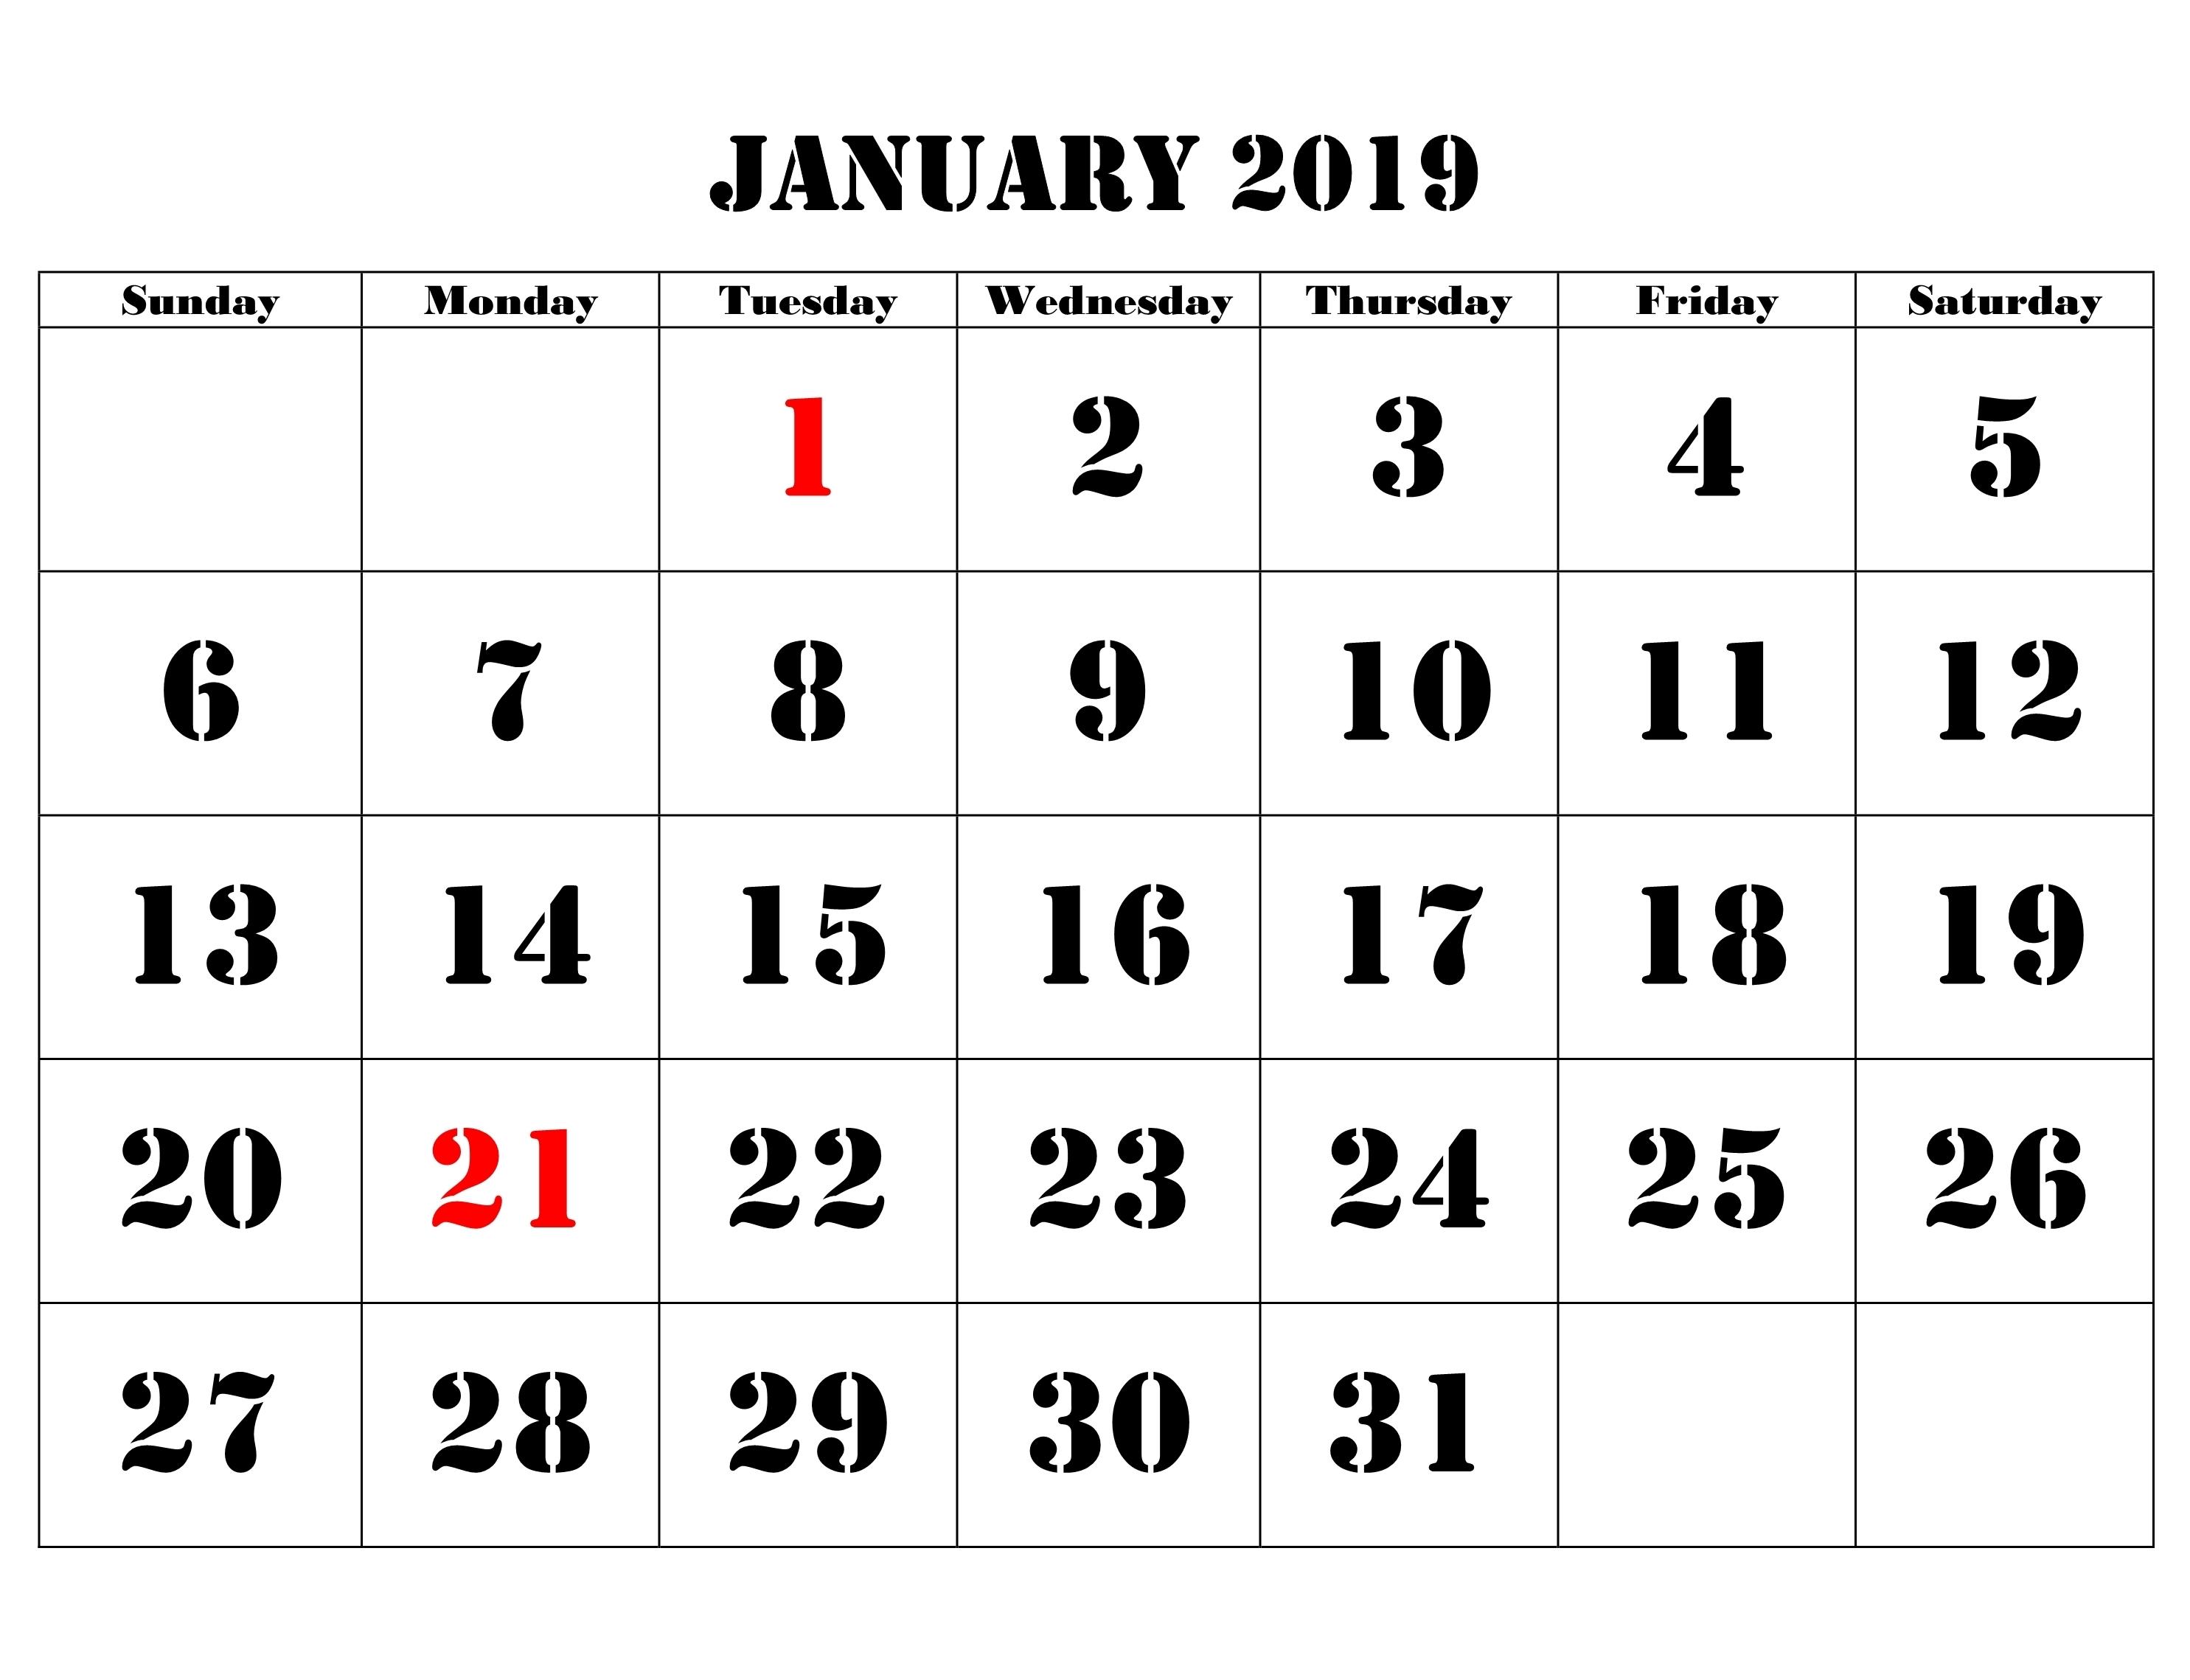 printable calendar january 2019 monthly printable calendar 2018::January 2019 Monthly Calendar